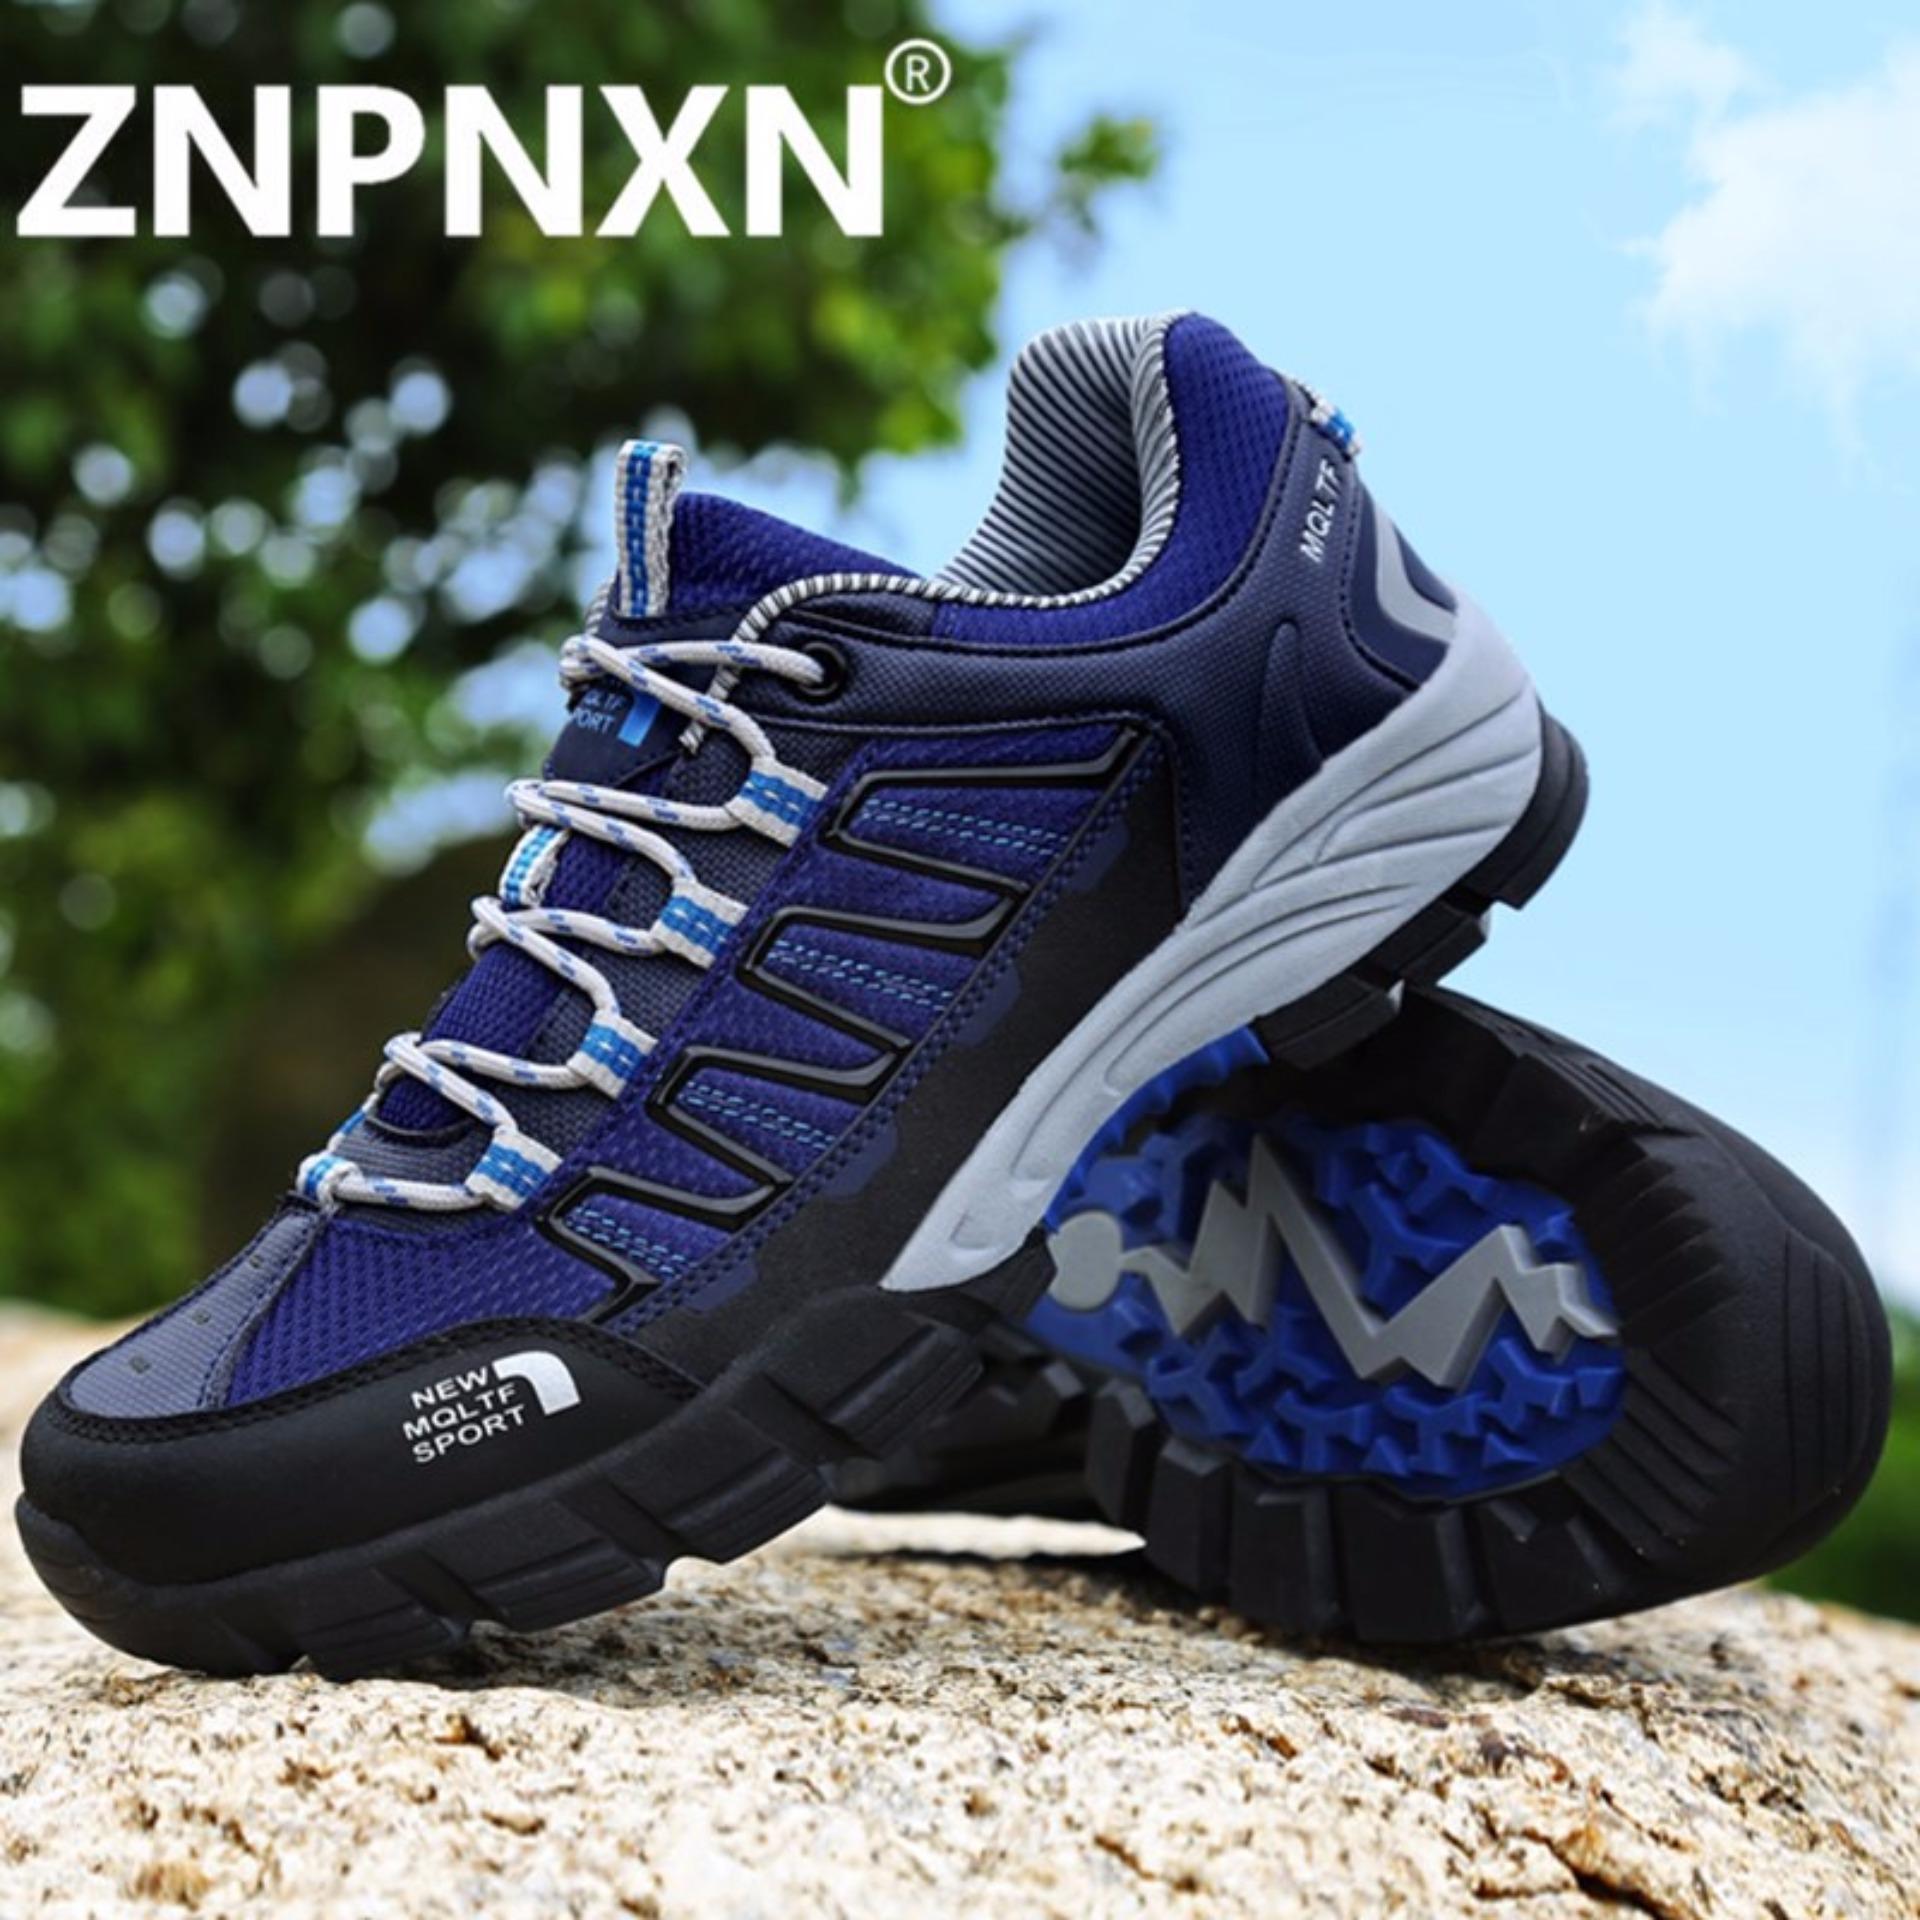 Promo Znpnxn Kaus Waterproof Hiking Sepatu Outdoor Boots Grey Trekking Olahraga Sneakers Pria Breathable Alas Kaki Sepatu Biru Tua Intl Di Tiongkok